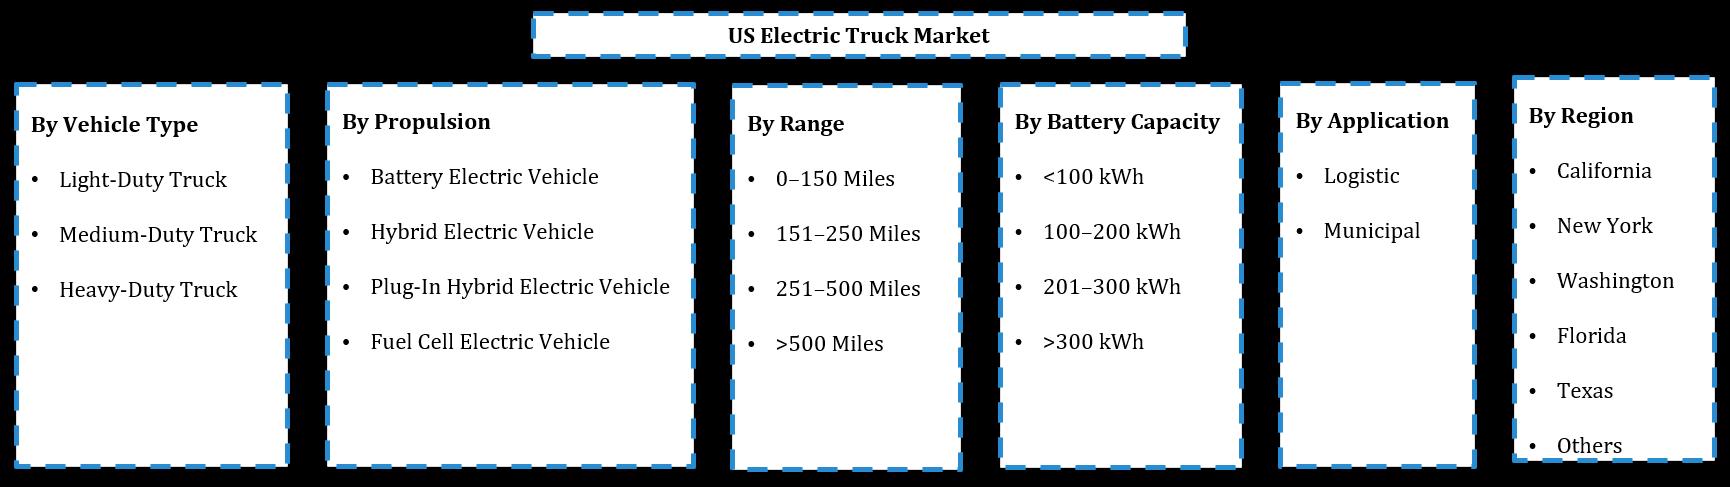 USA Electric Truck Market Segmentation